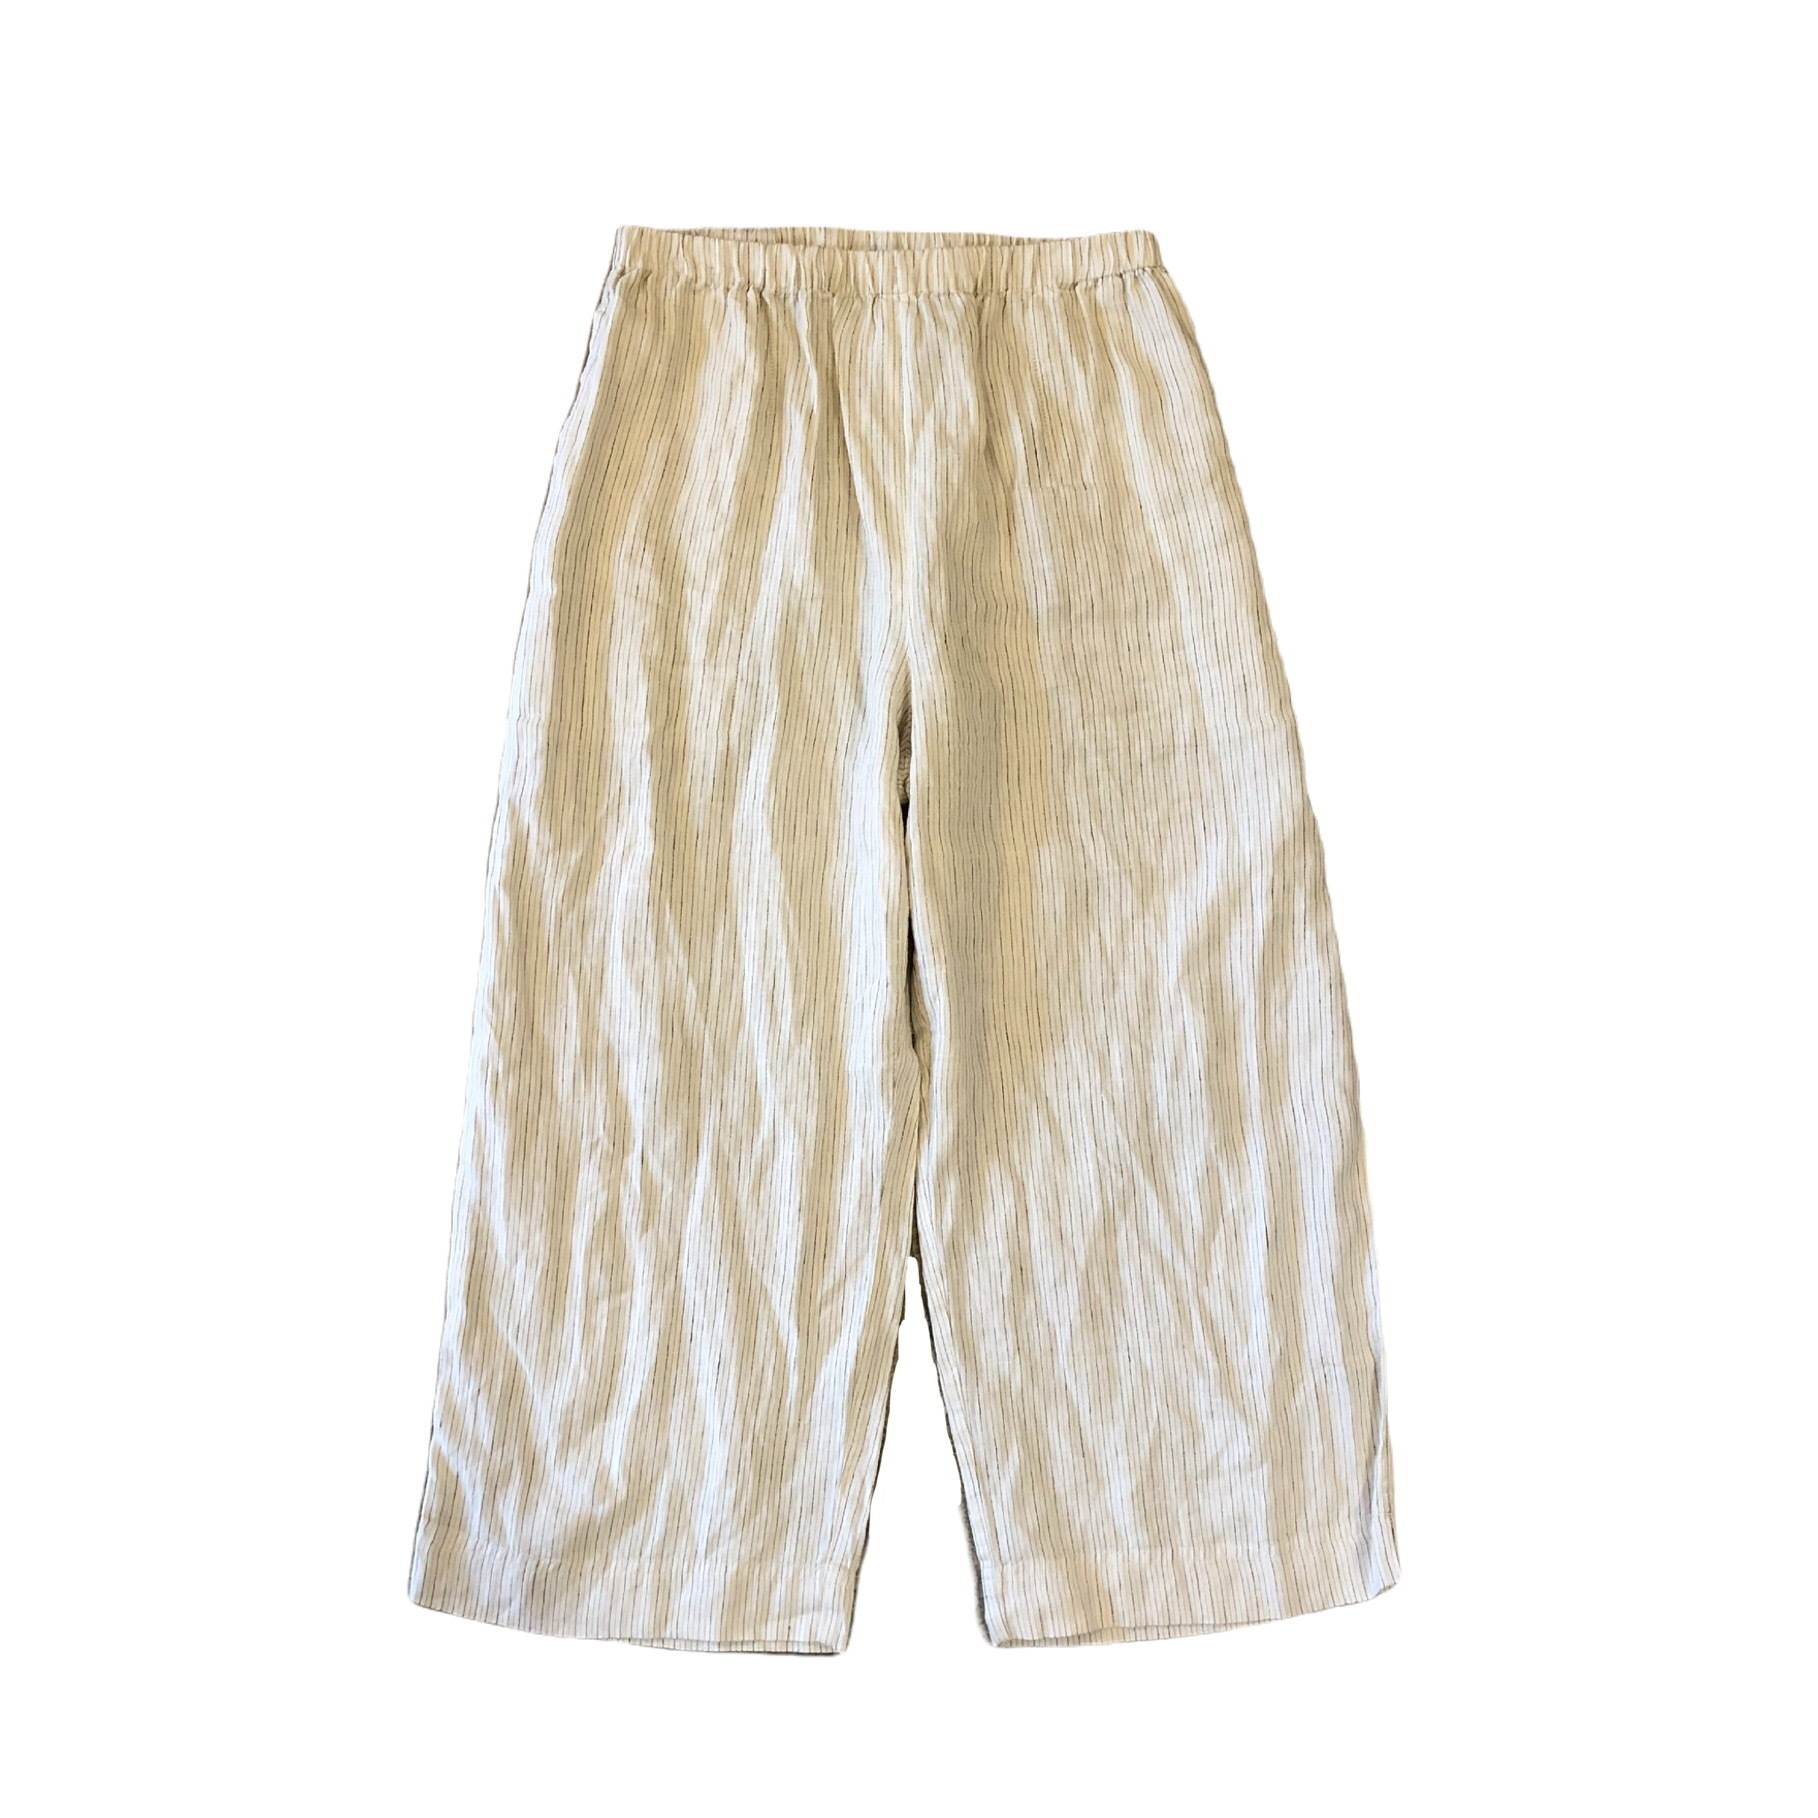 Chico's Stripe Easy Pants ¥5,400+tax